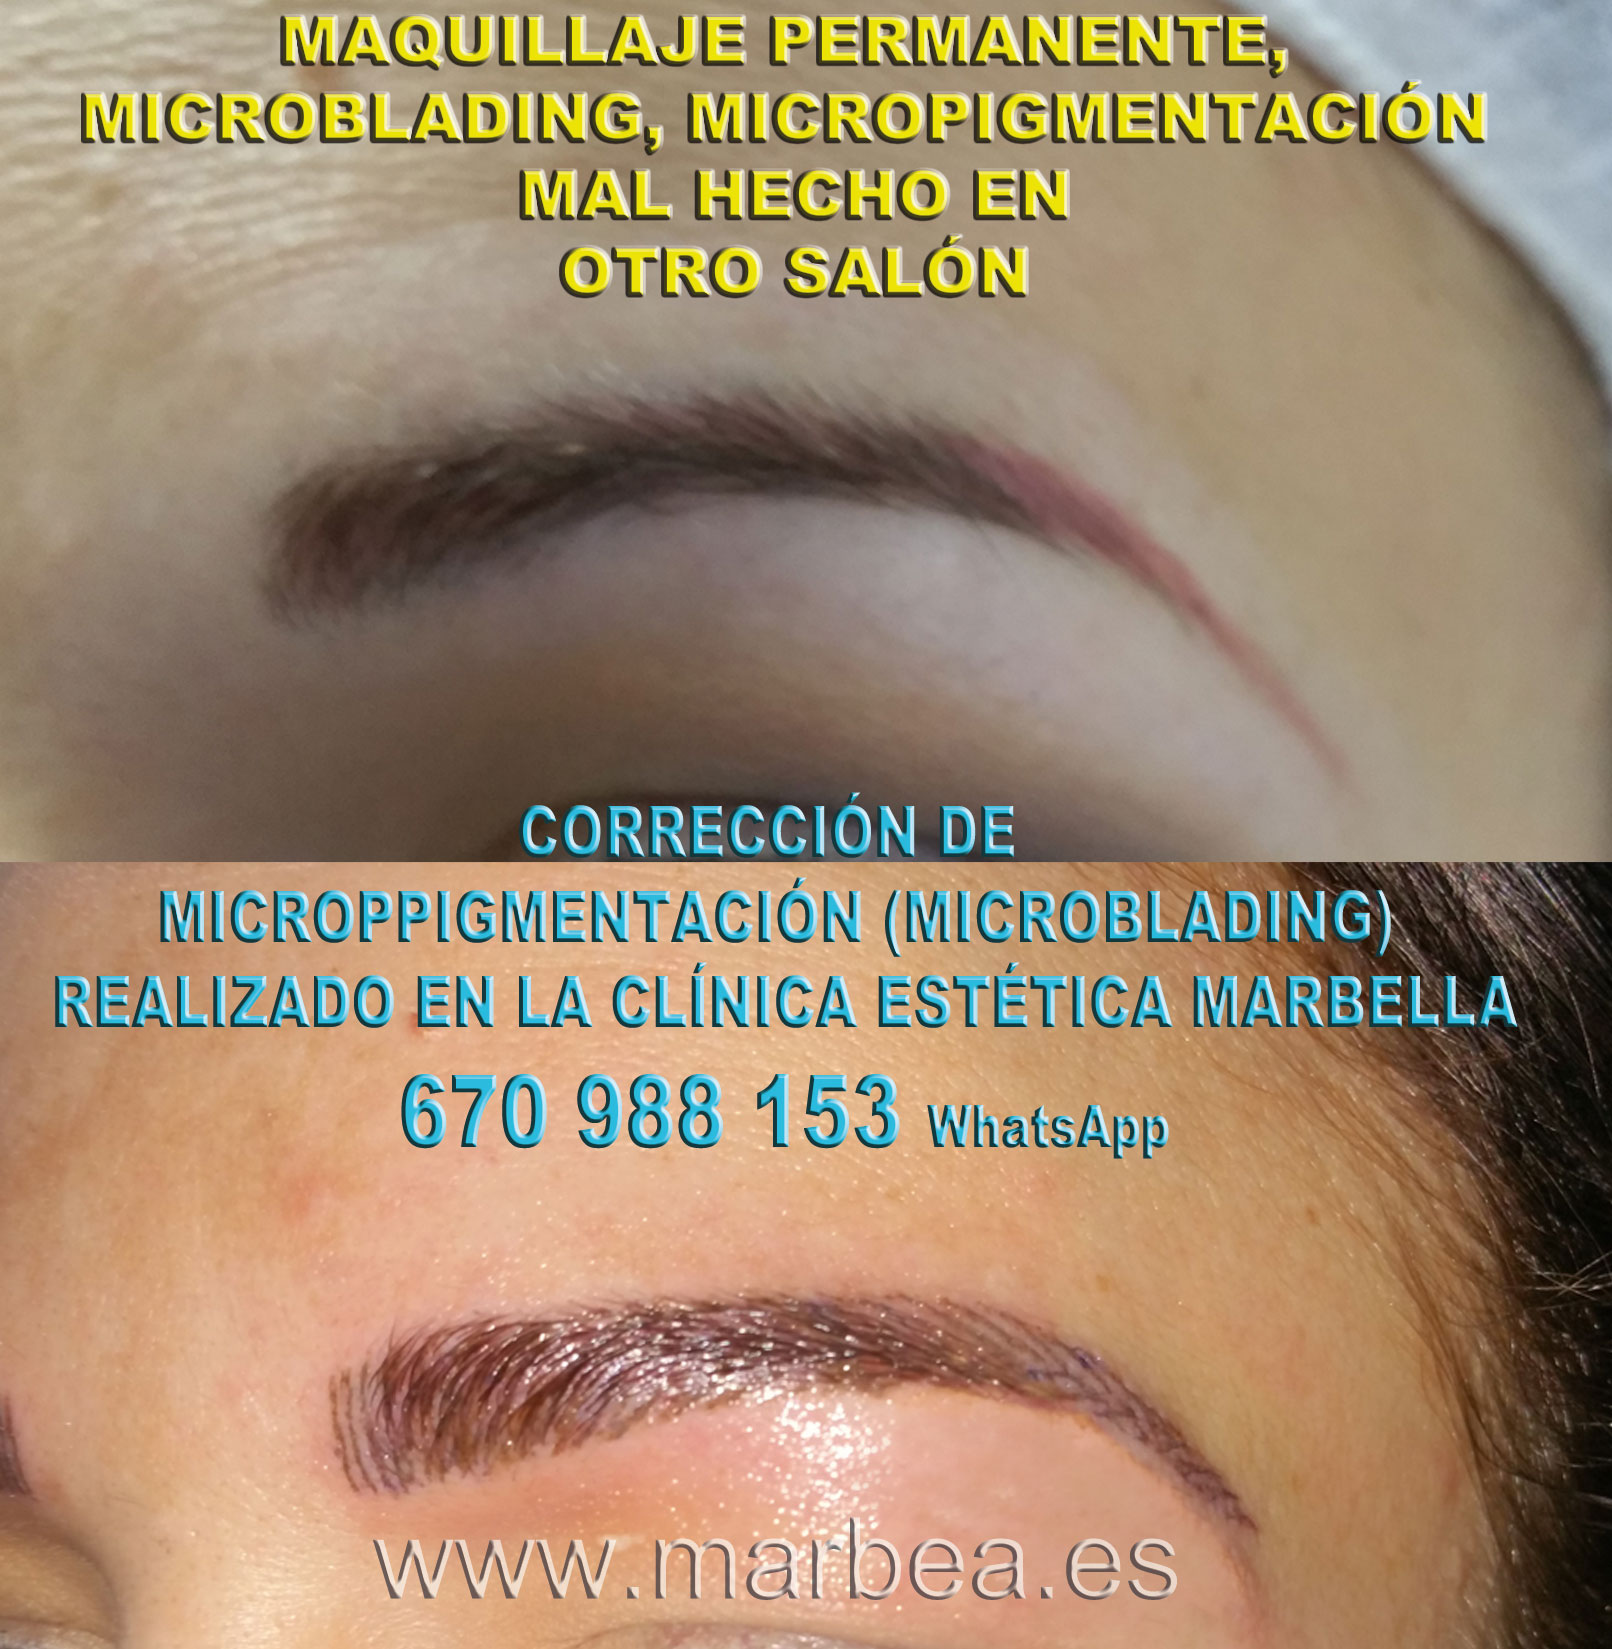 ELIMINAR MICROBLADING CEJAS clínica estética microblading propone eliminar la micropigmentación de cejas,corregir micropigmentación no deseada